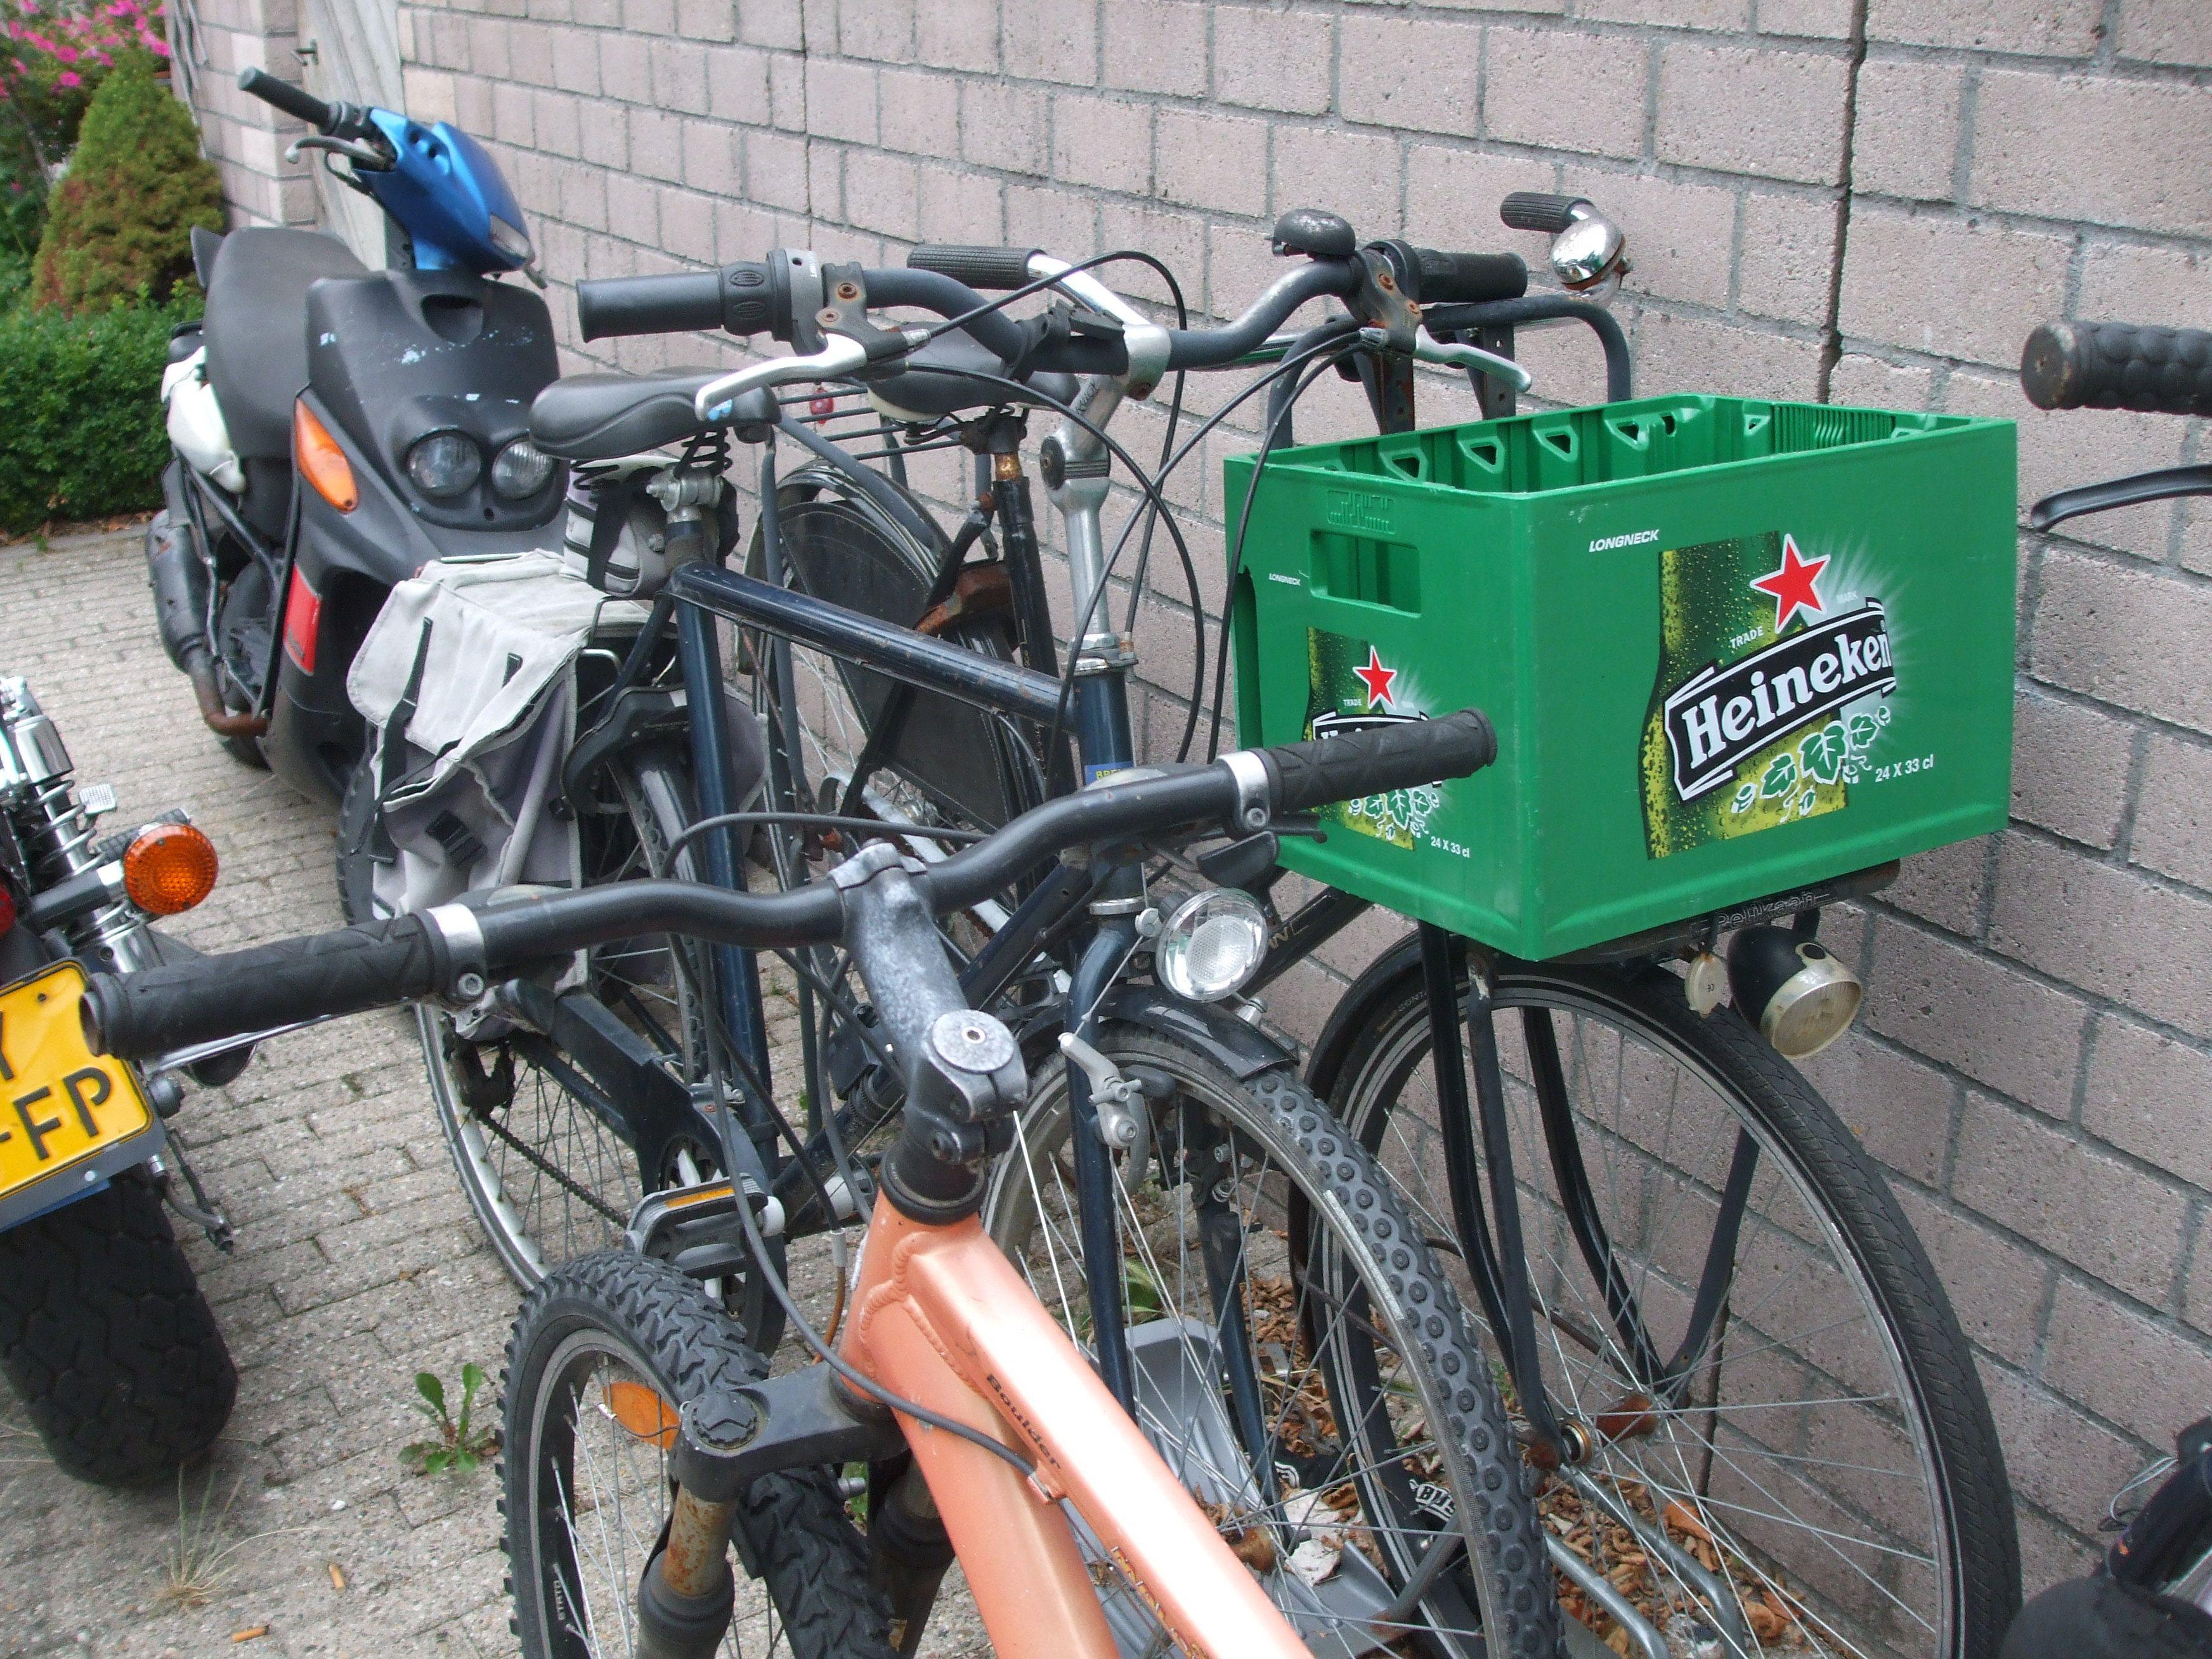 green plastic basket Heineken Beer | Bike Baskets | Pinterest